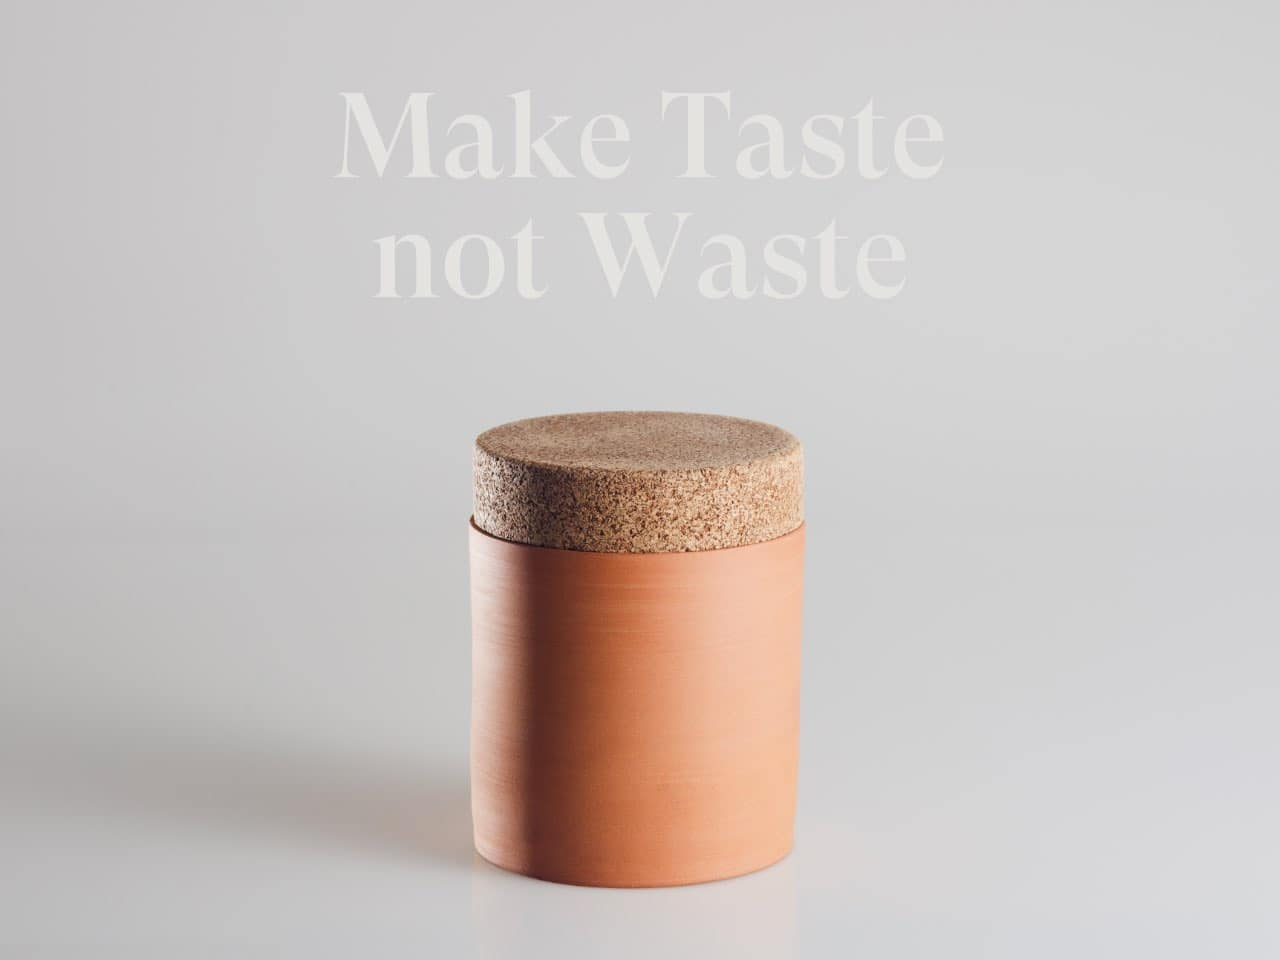 Nopresso Georg Kettele Make Taste Not Waste